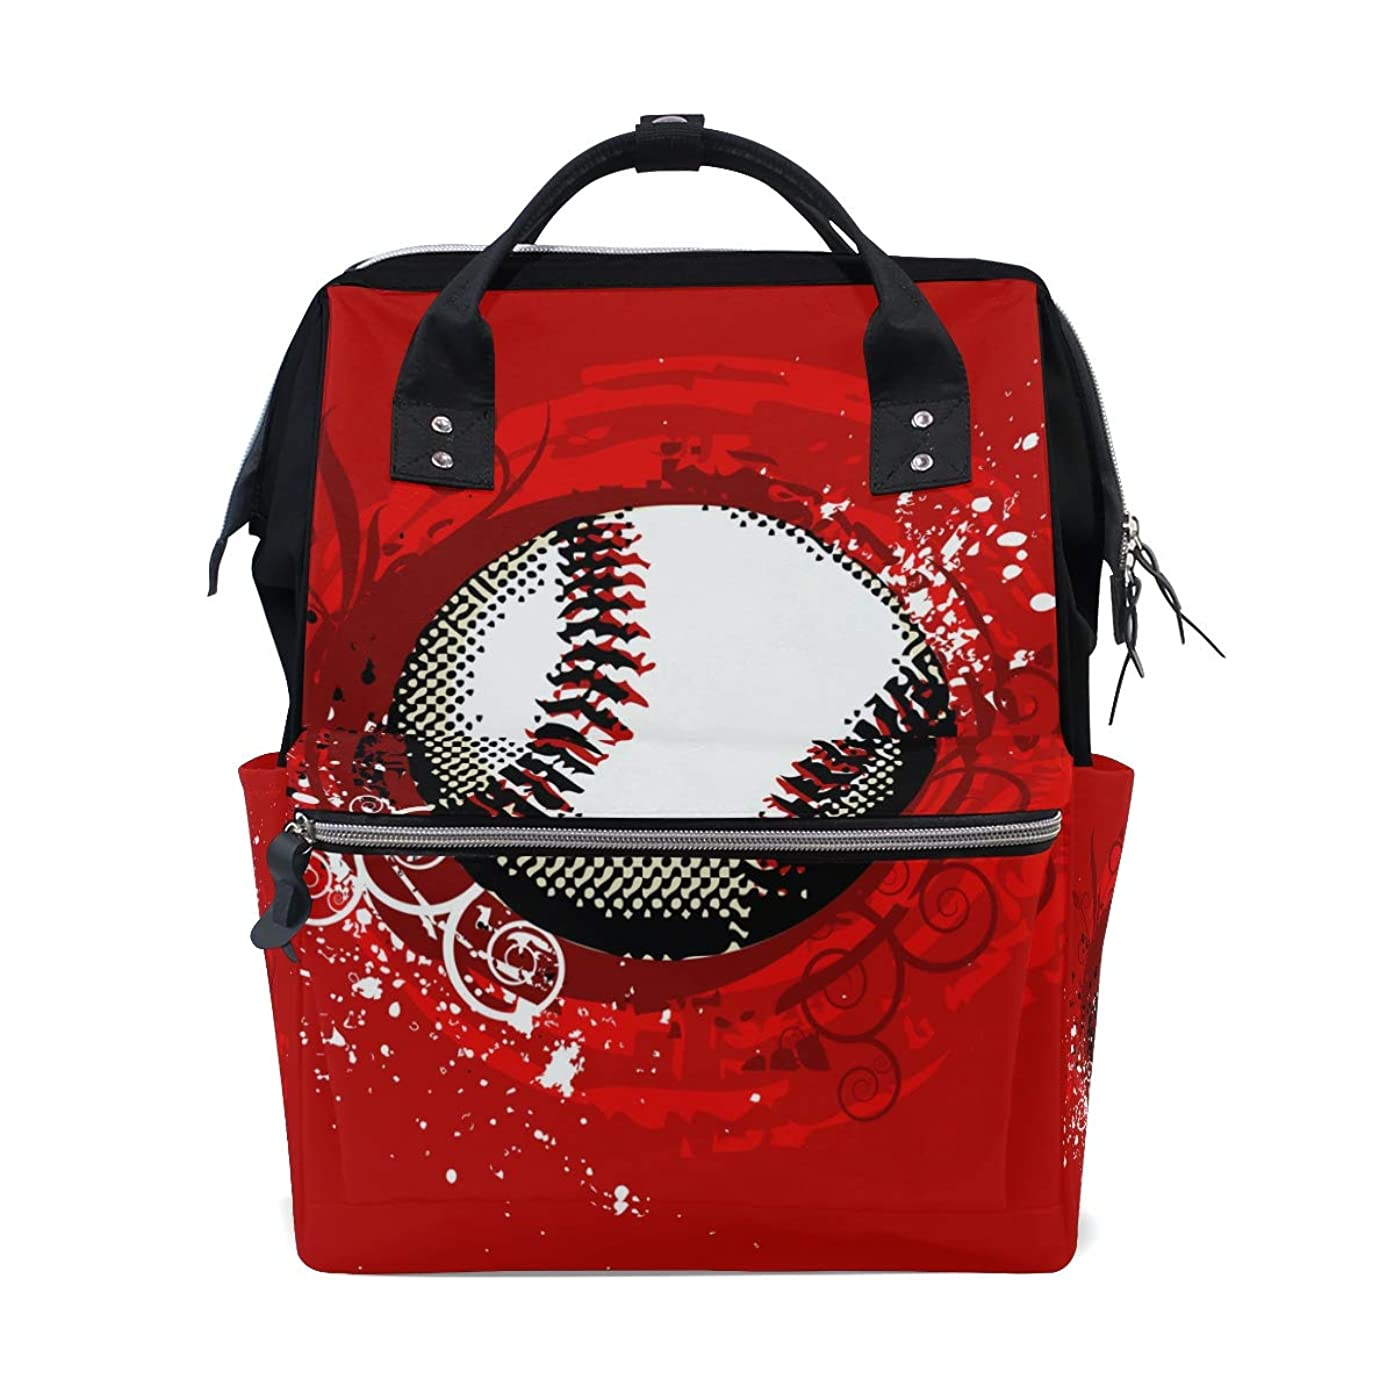 Red Baseball School Backpack Large Capacity Mummy Bags Laptop Handbag Casual Travel Rucksack Satchel For Women Men Adult Teen Children